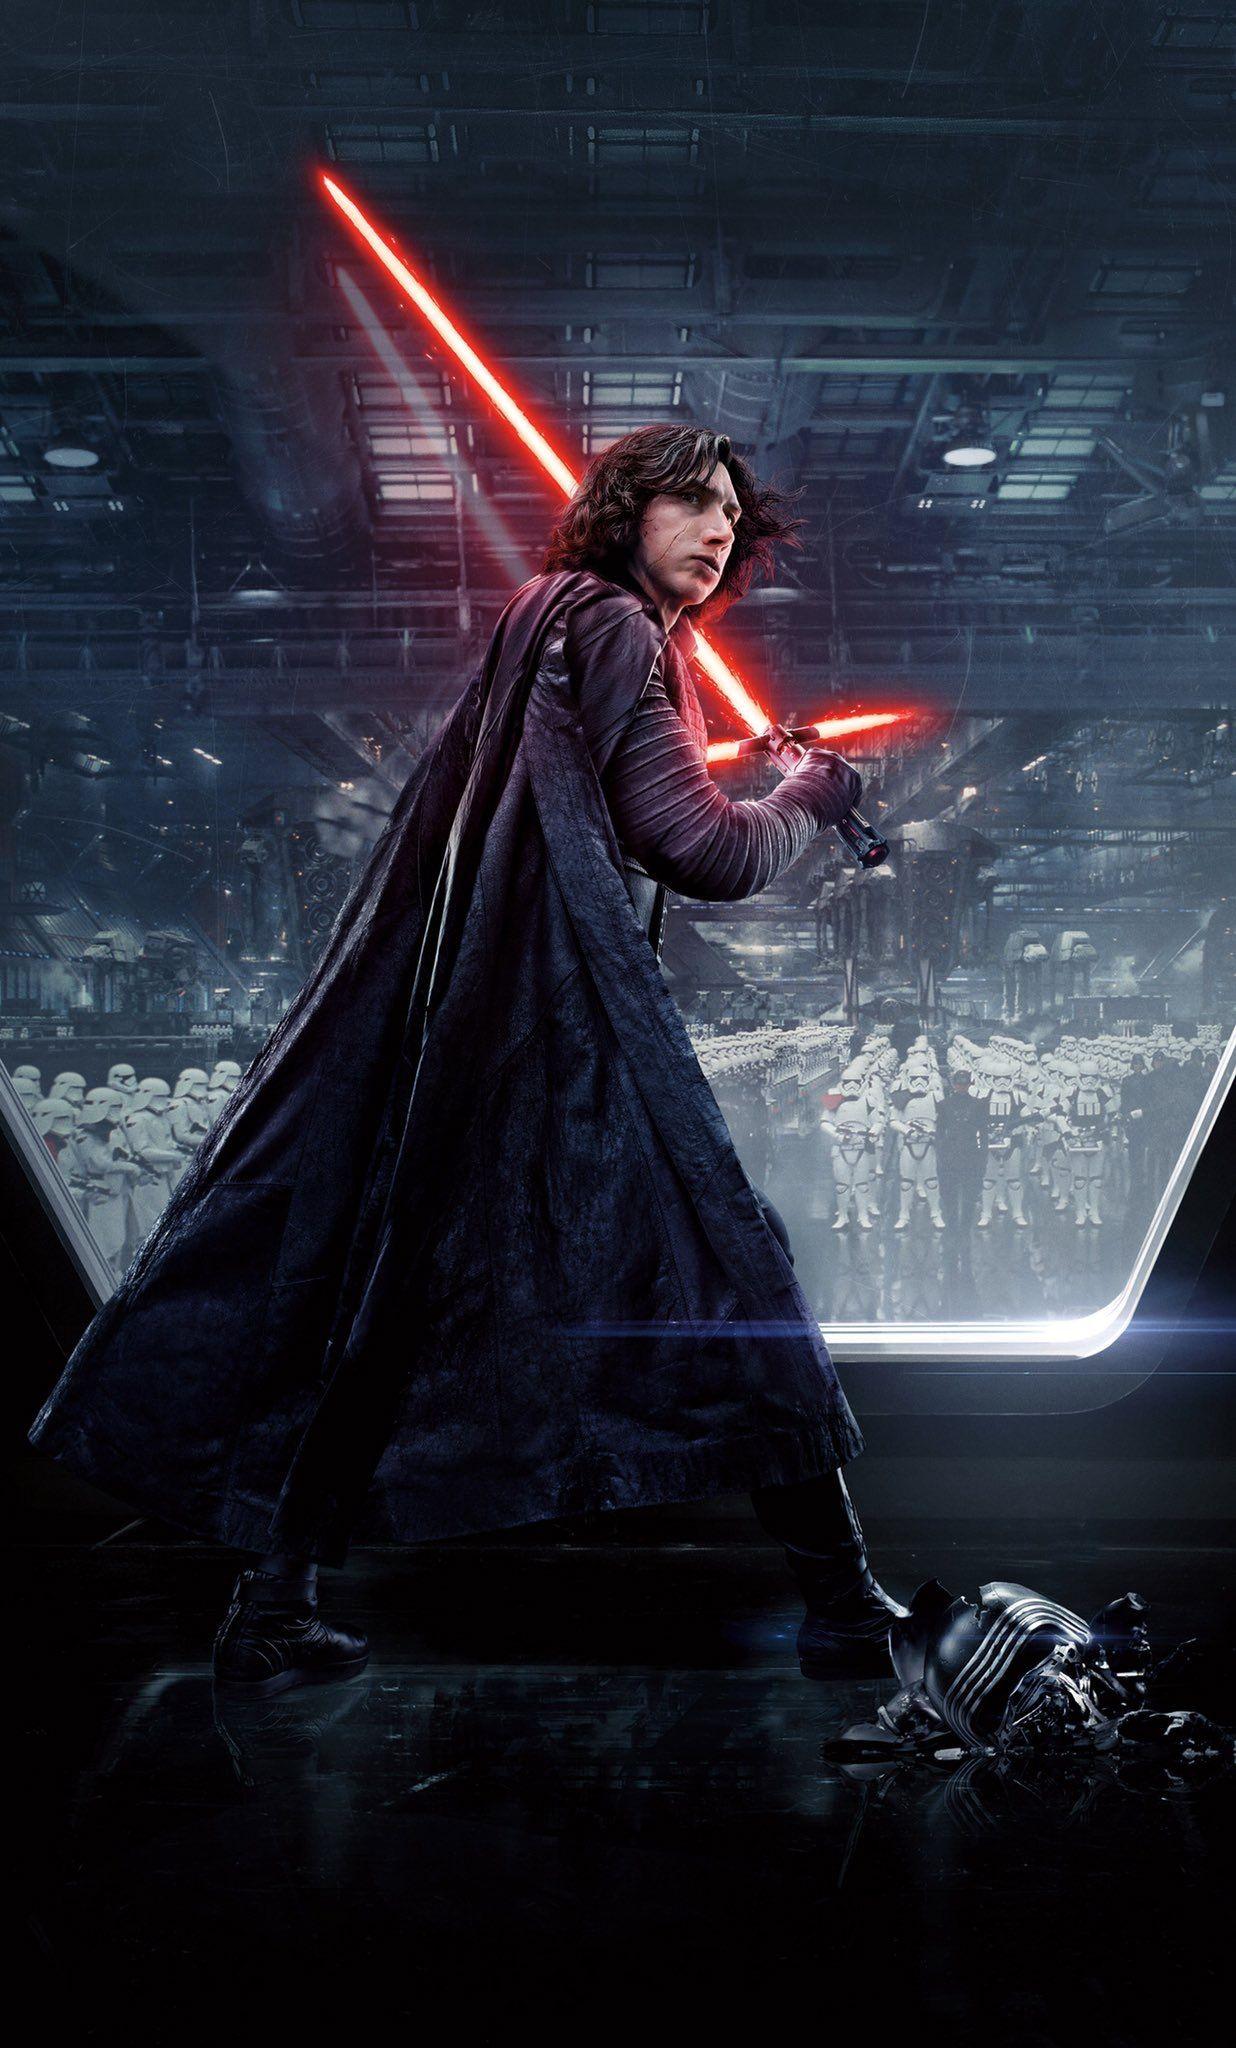 Pin By Minoru Takahashi On Sw Ep 1 8 Ren Star Wars Star Wars Poster Star Wars Wallpaper